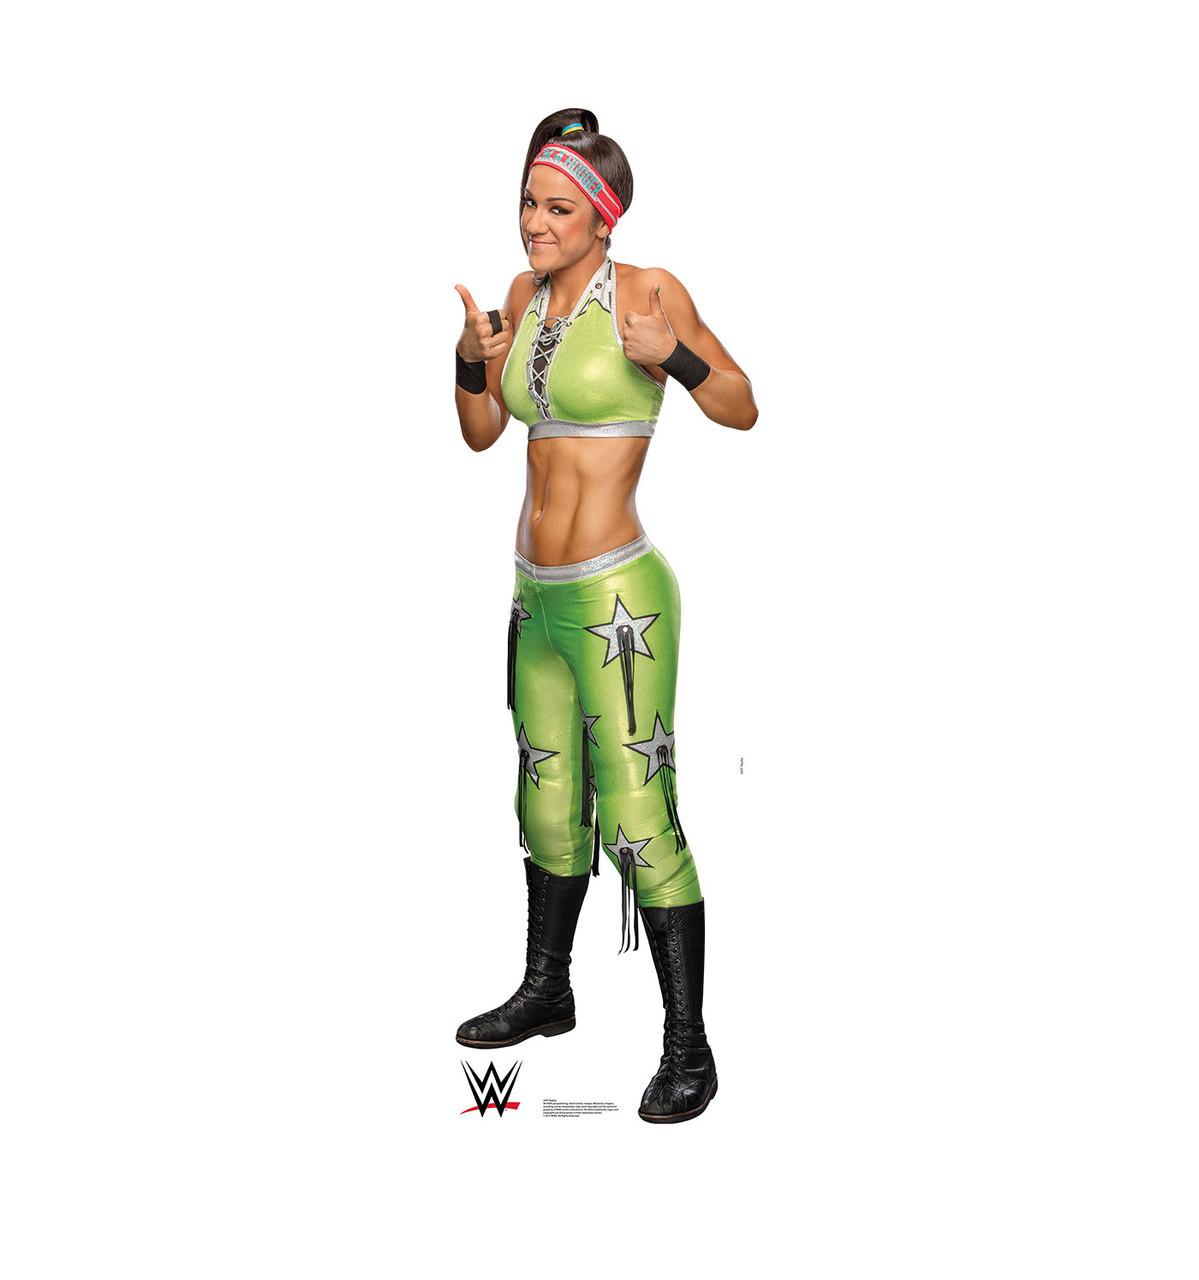 Life-size Bayley - WWE Cardboard Standup 3